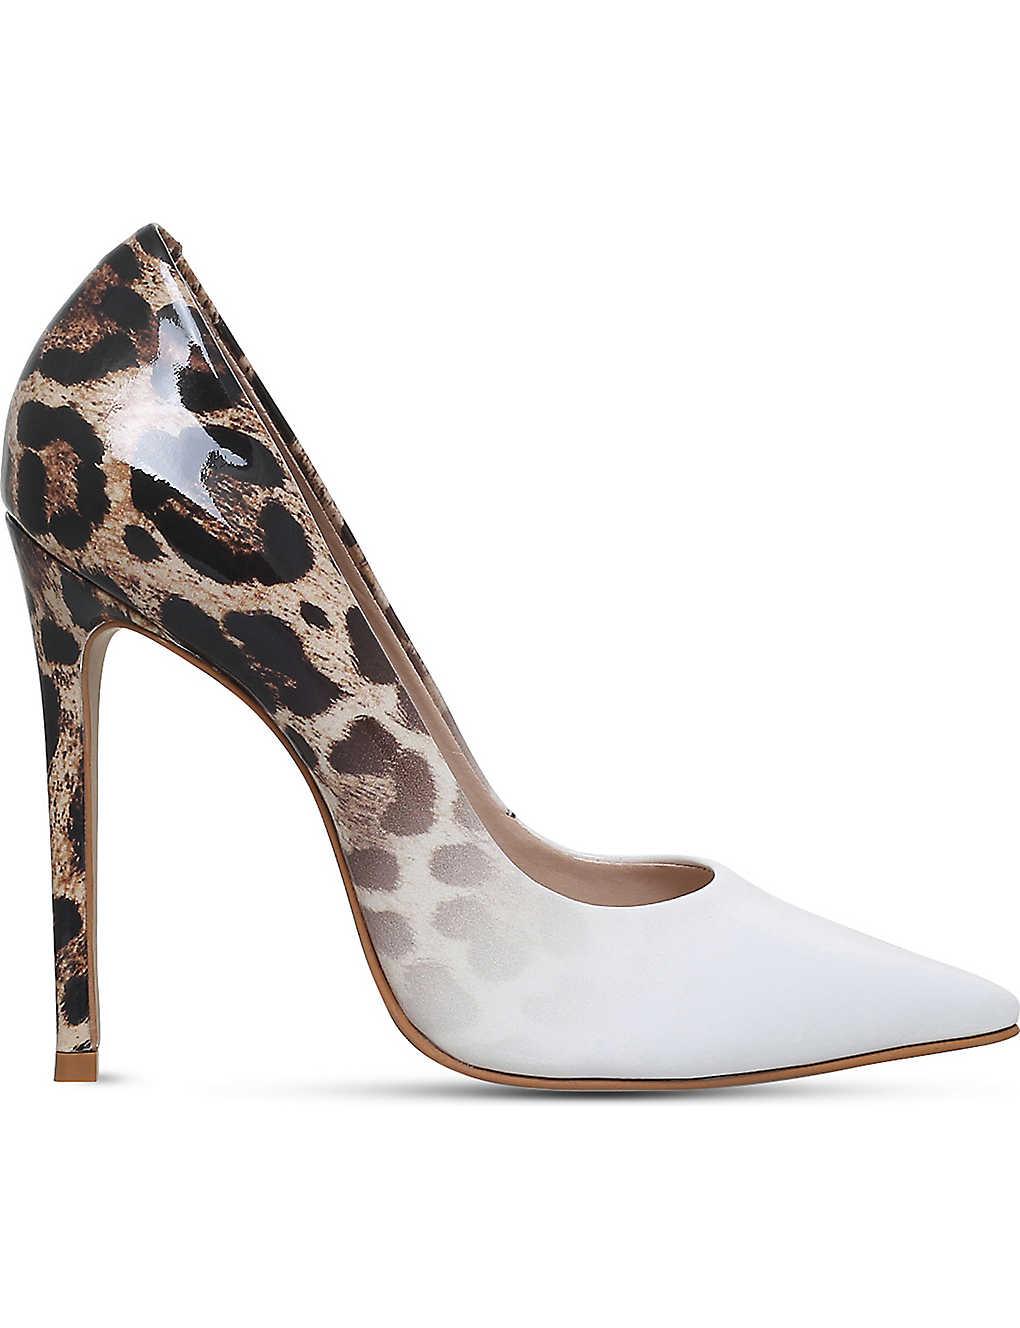 210769ce4b CARVELA - Alice patent-leather courts   Selfridges.com